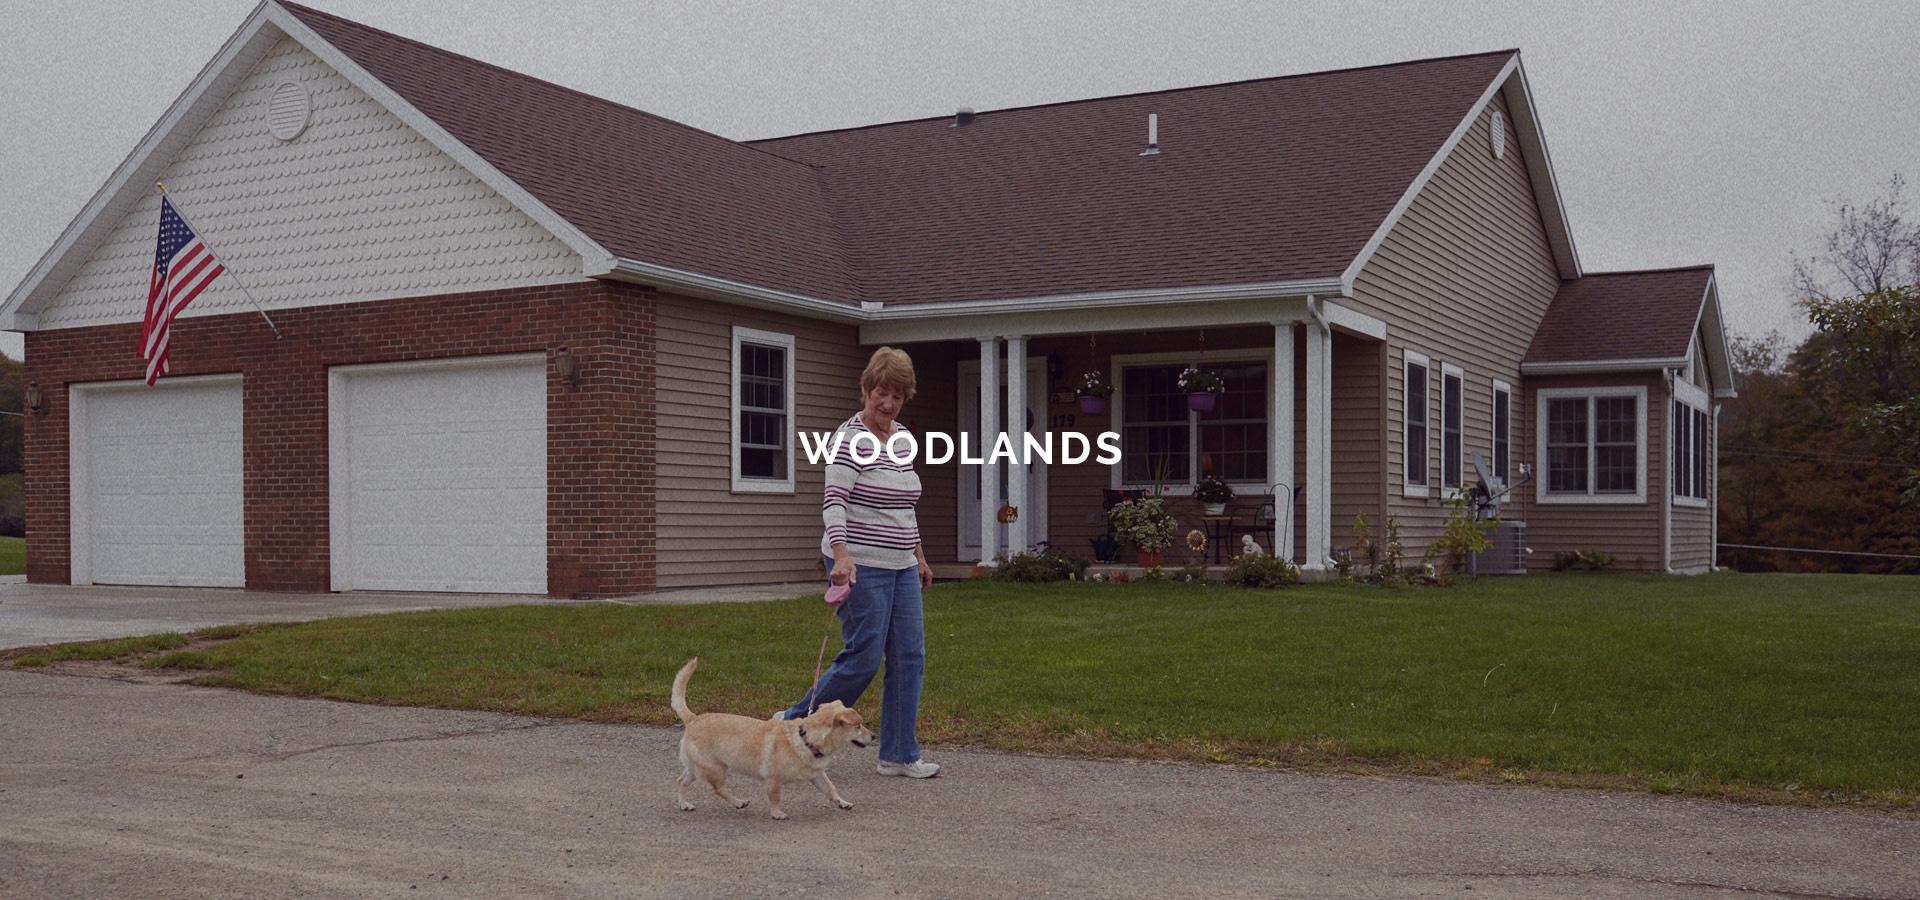 Woodlands-heritage-ministries-location-senior-retirement-community